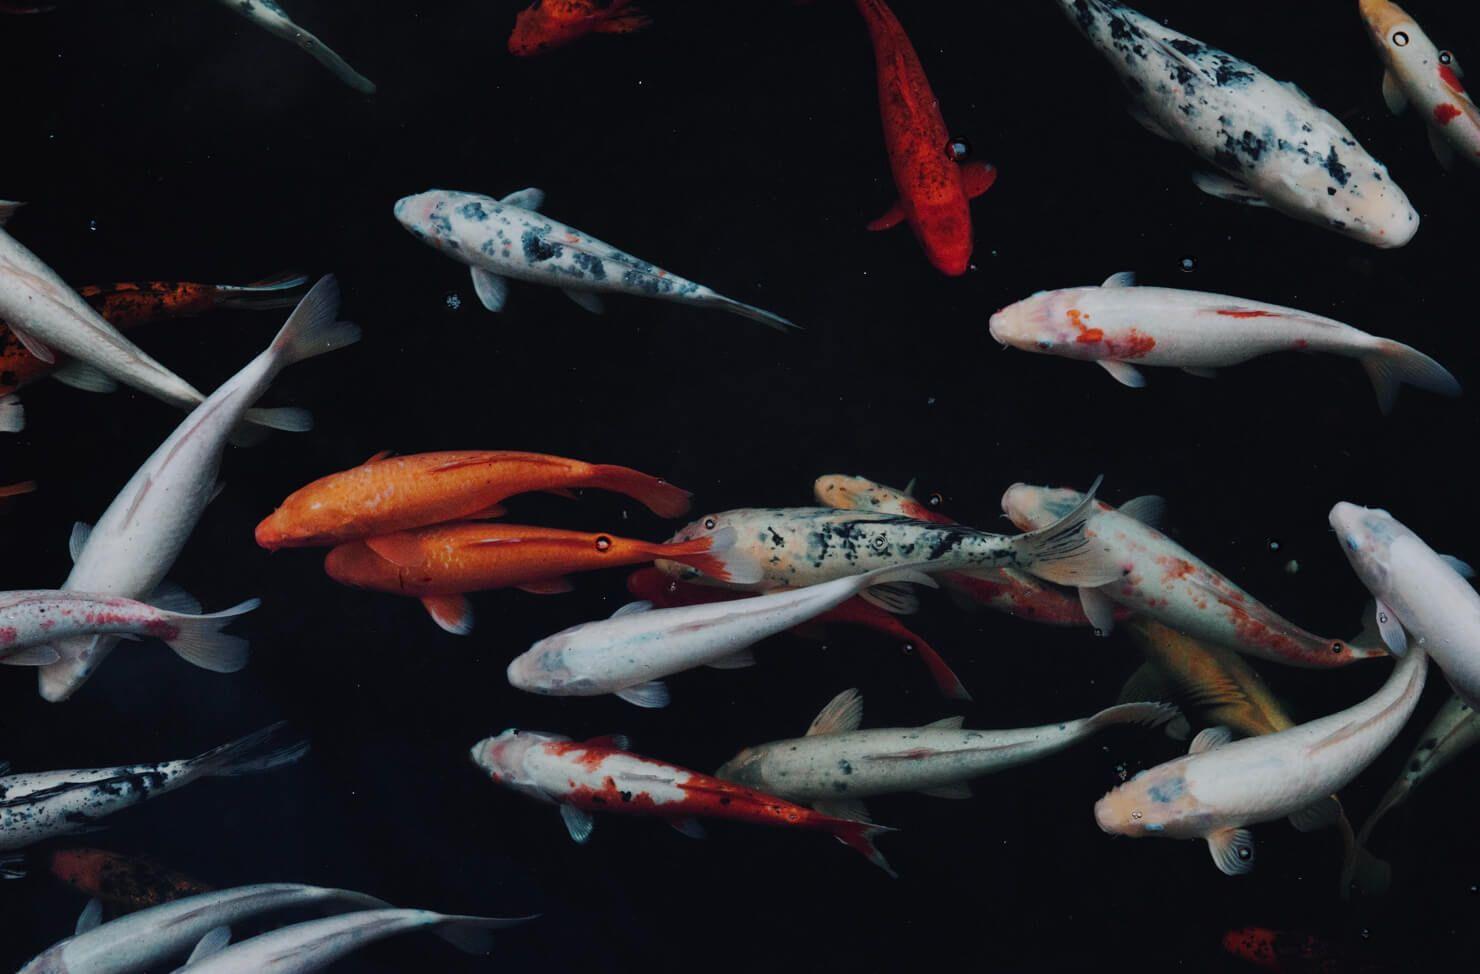 raw fish hazardous waste